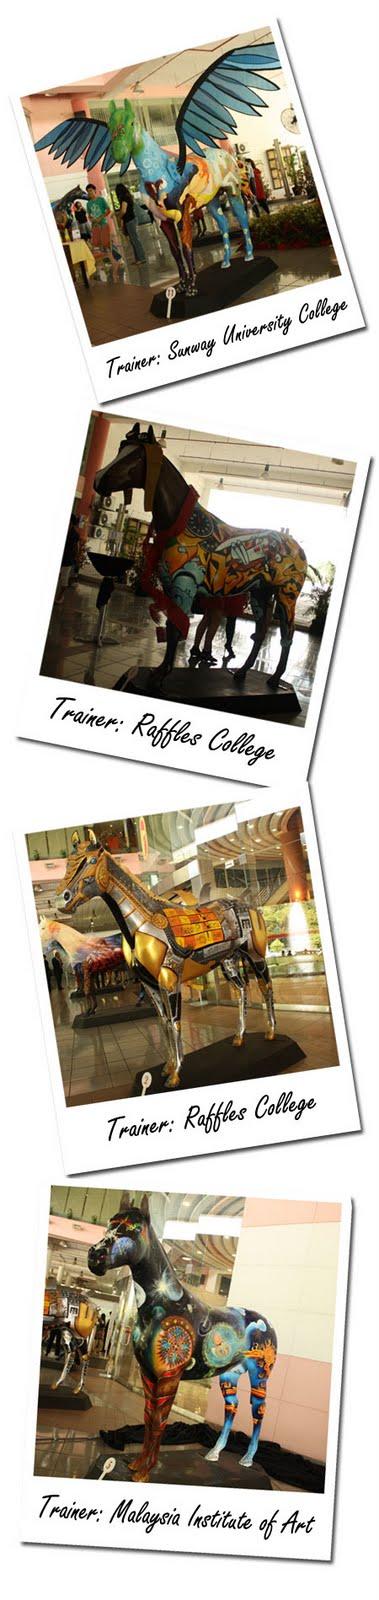 selangor turf club horse transformation 2